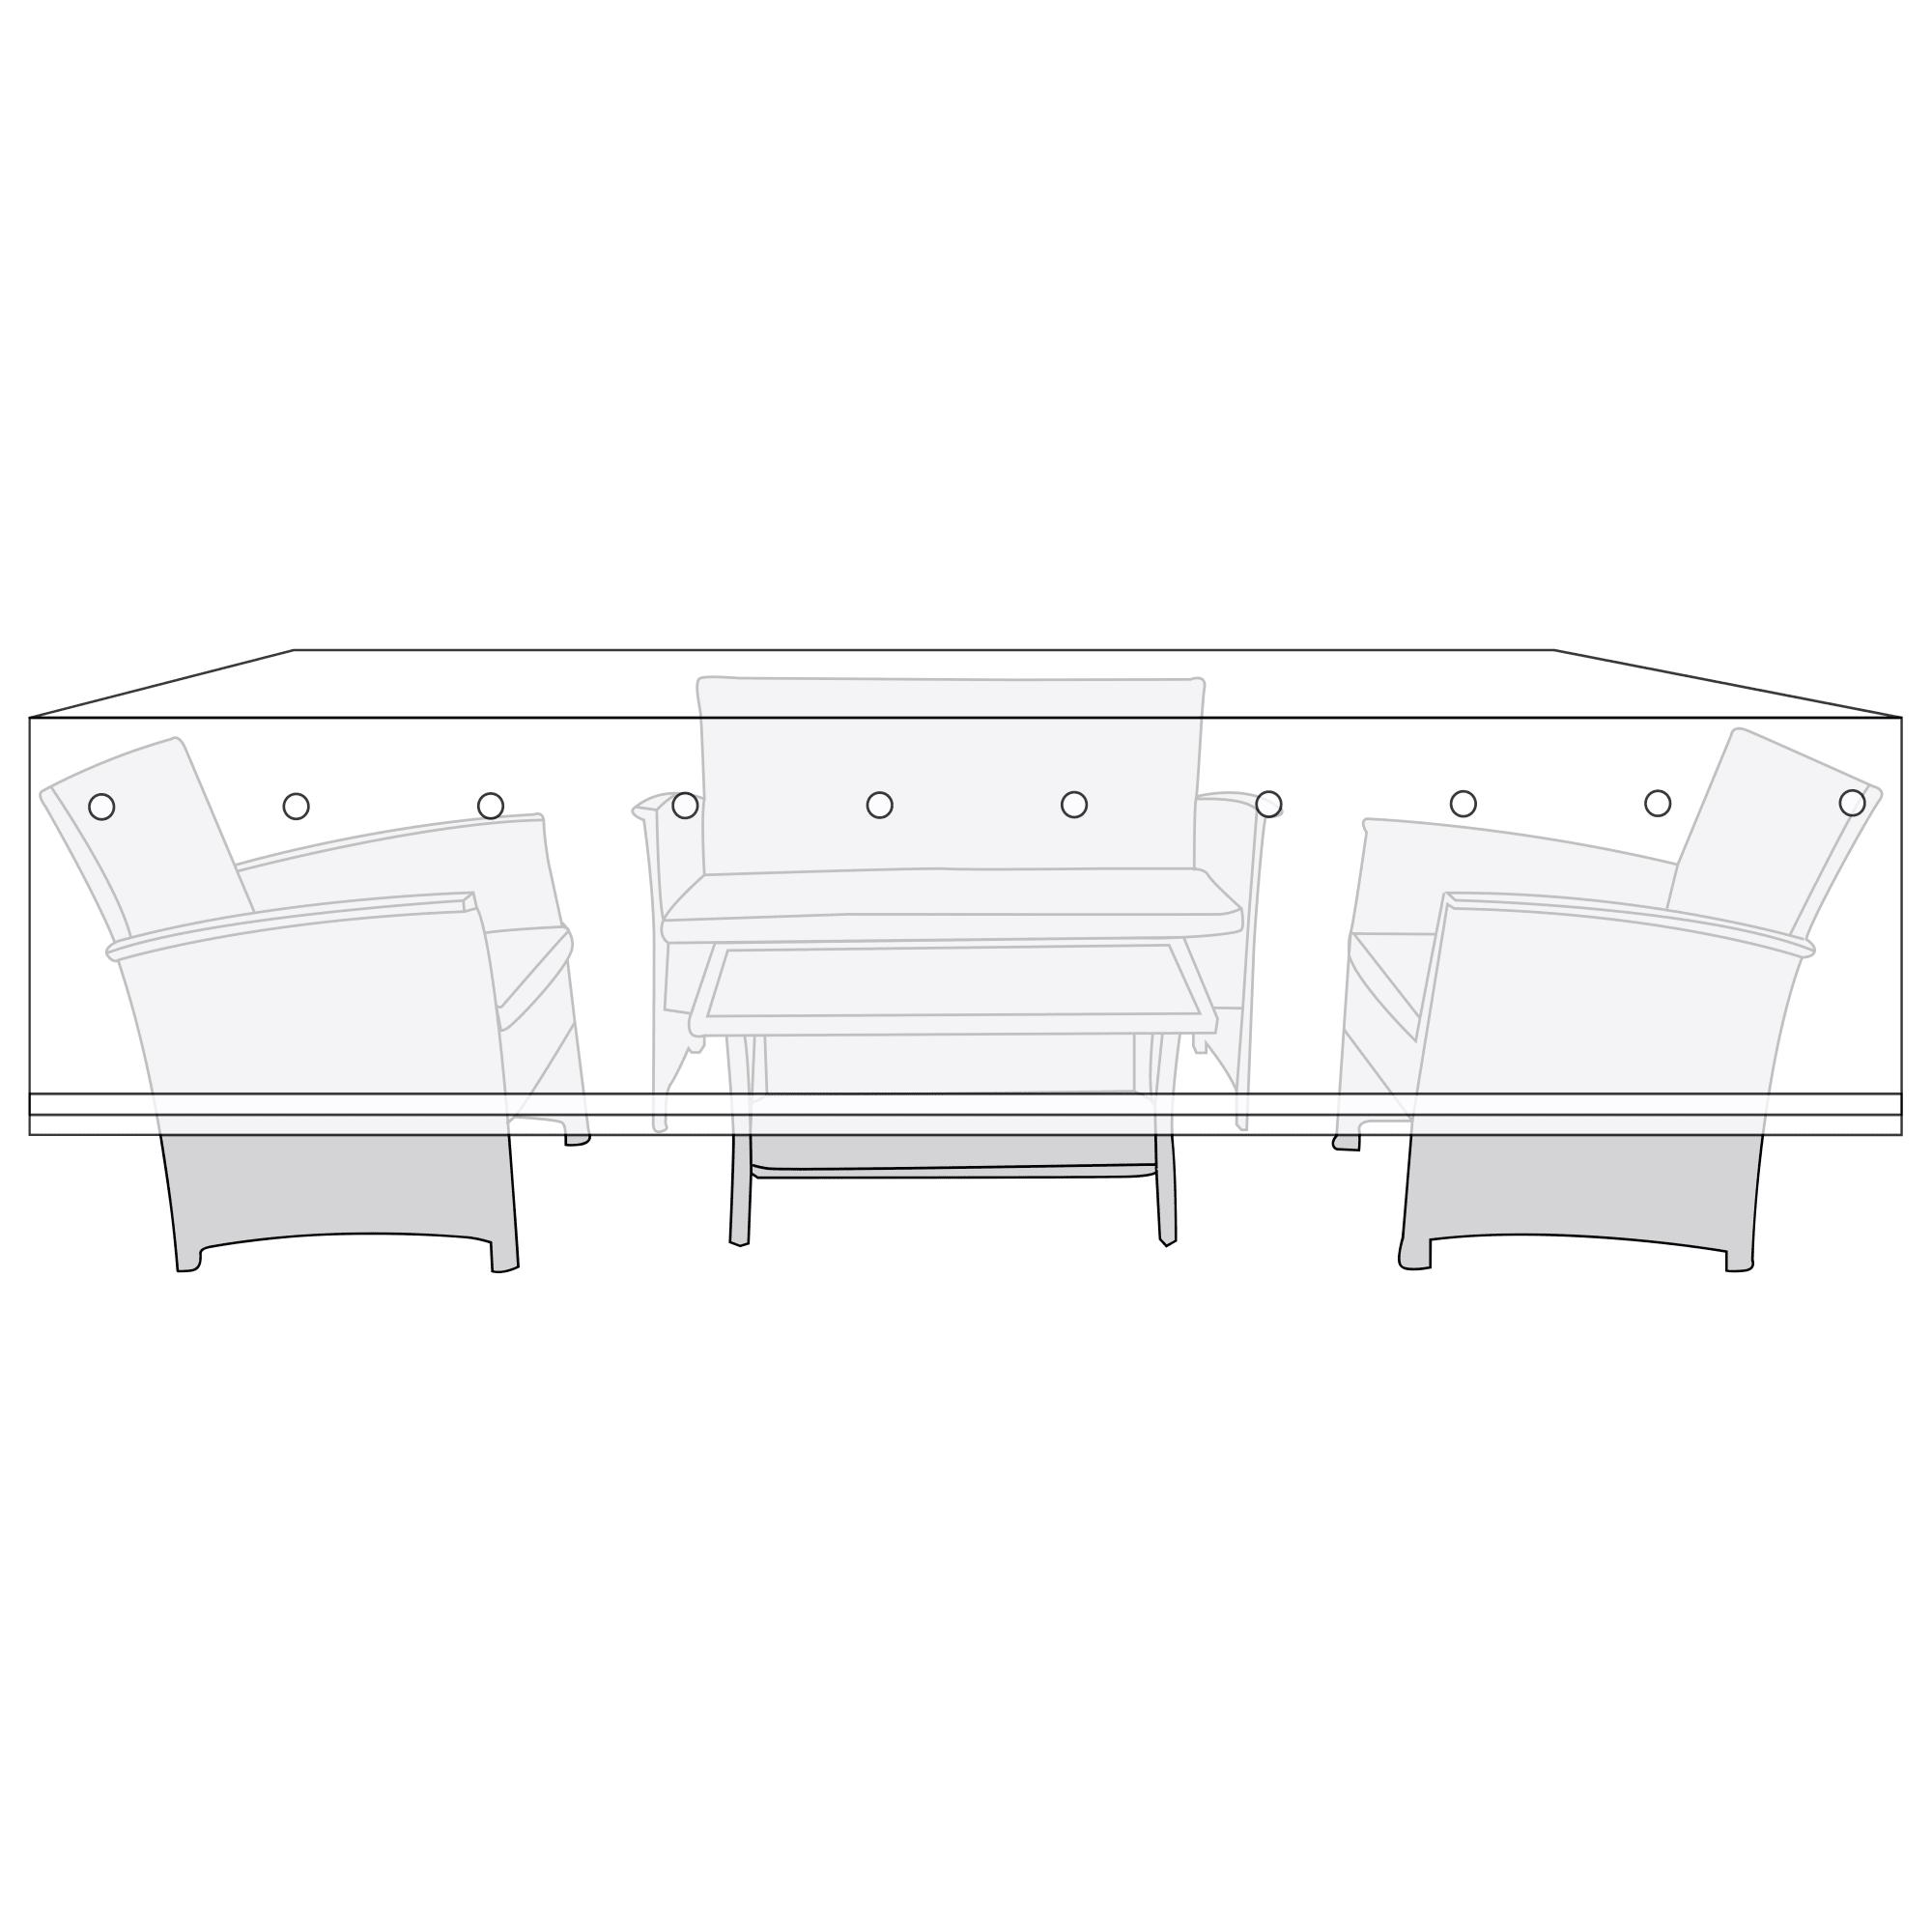 H 77 x B 145 x D 190 cm - Polyester